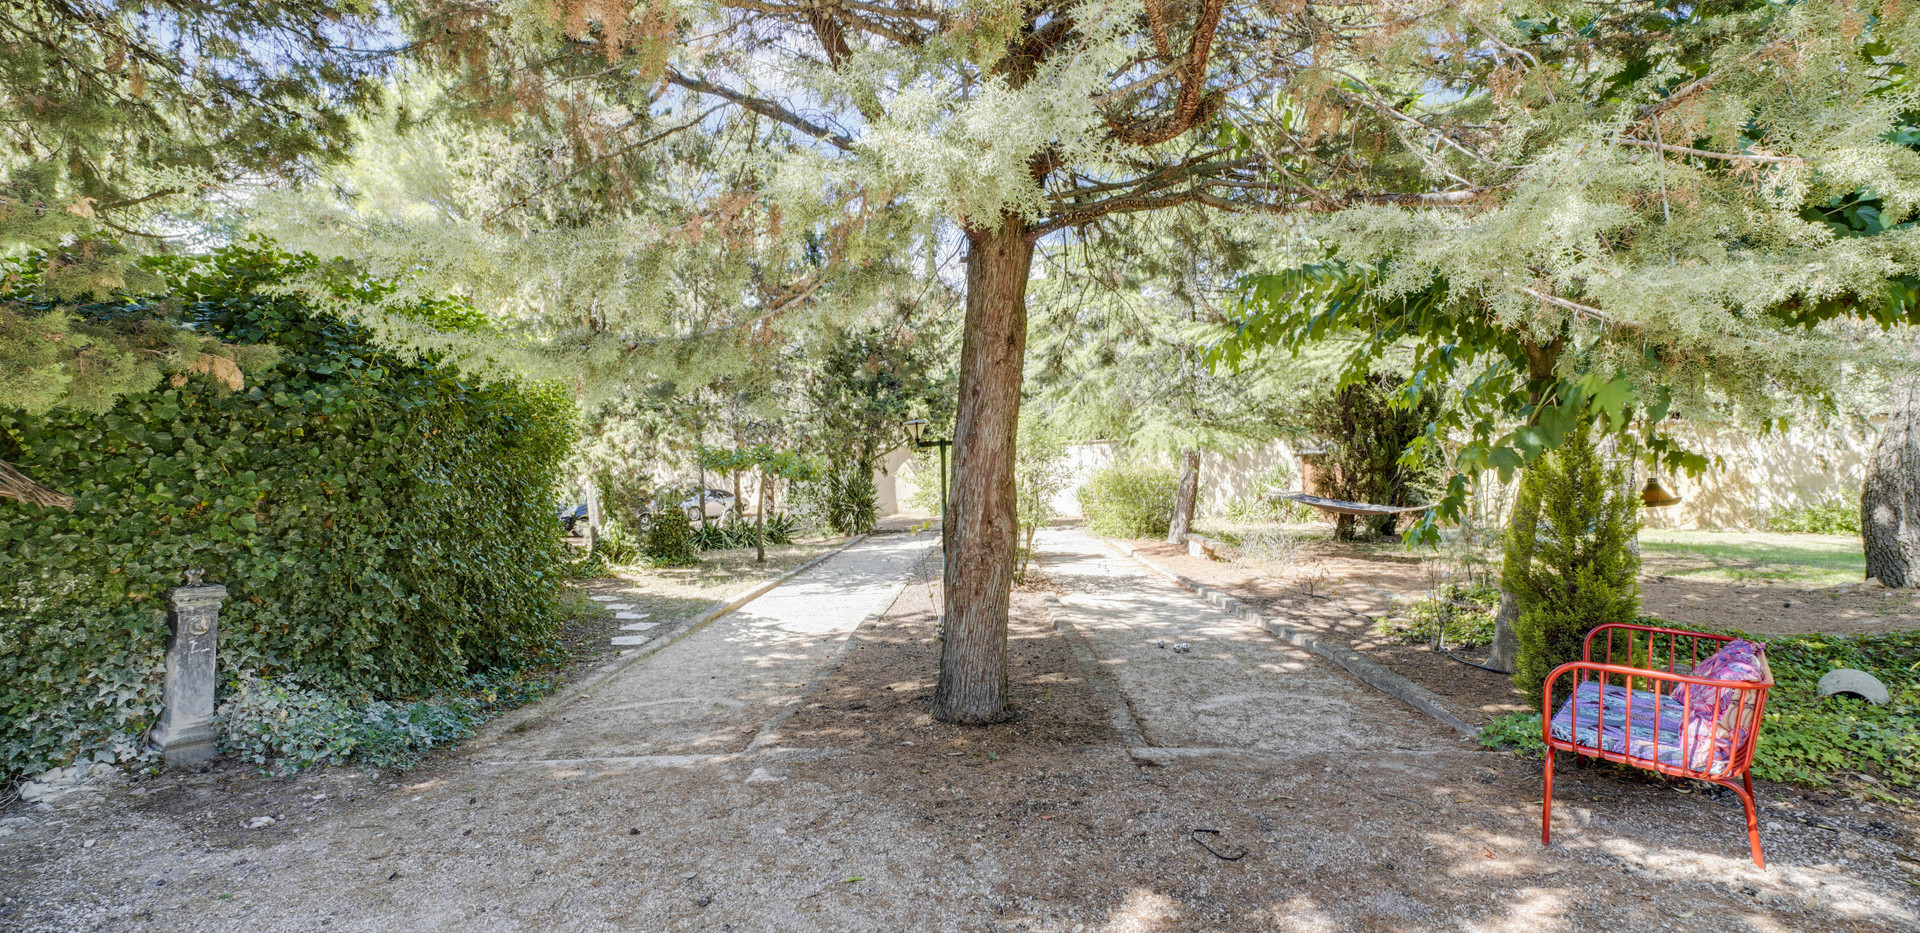 The petanque grounds of Mas Saint-Gens